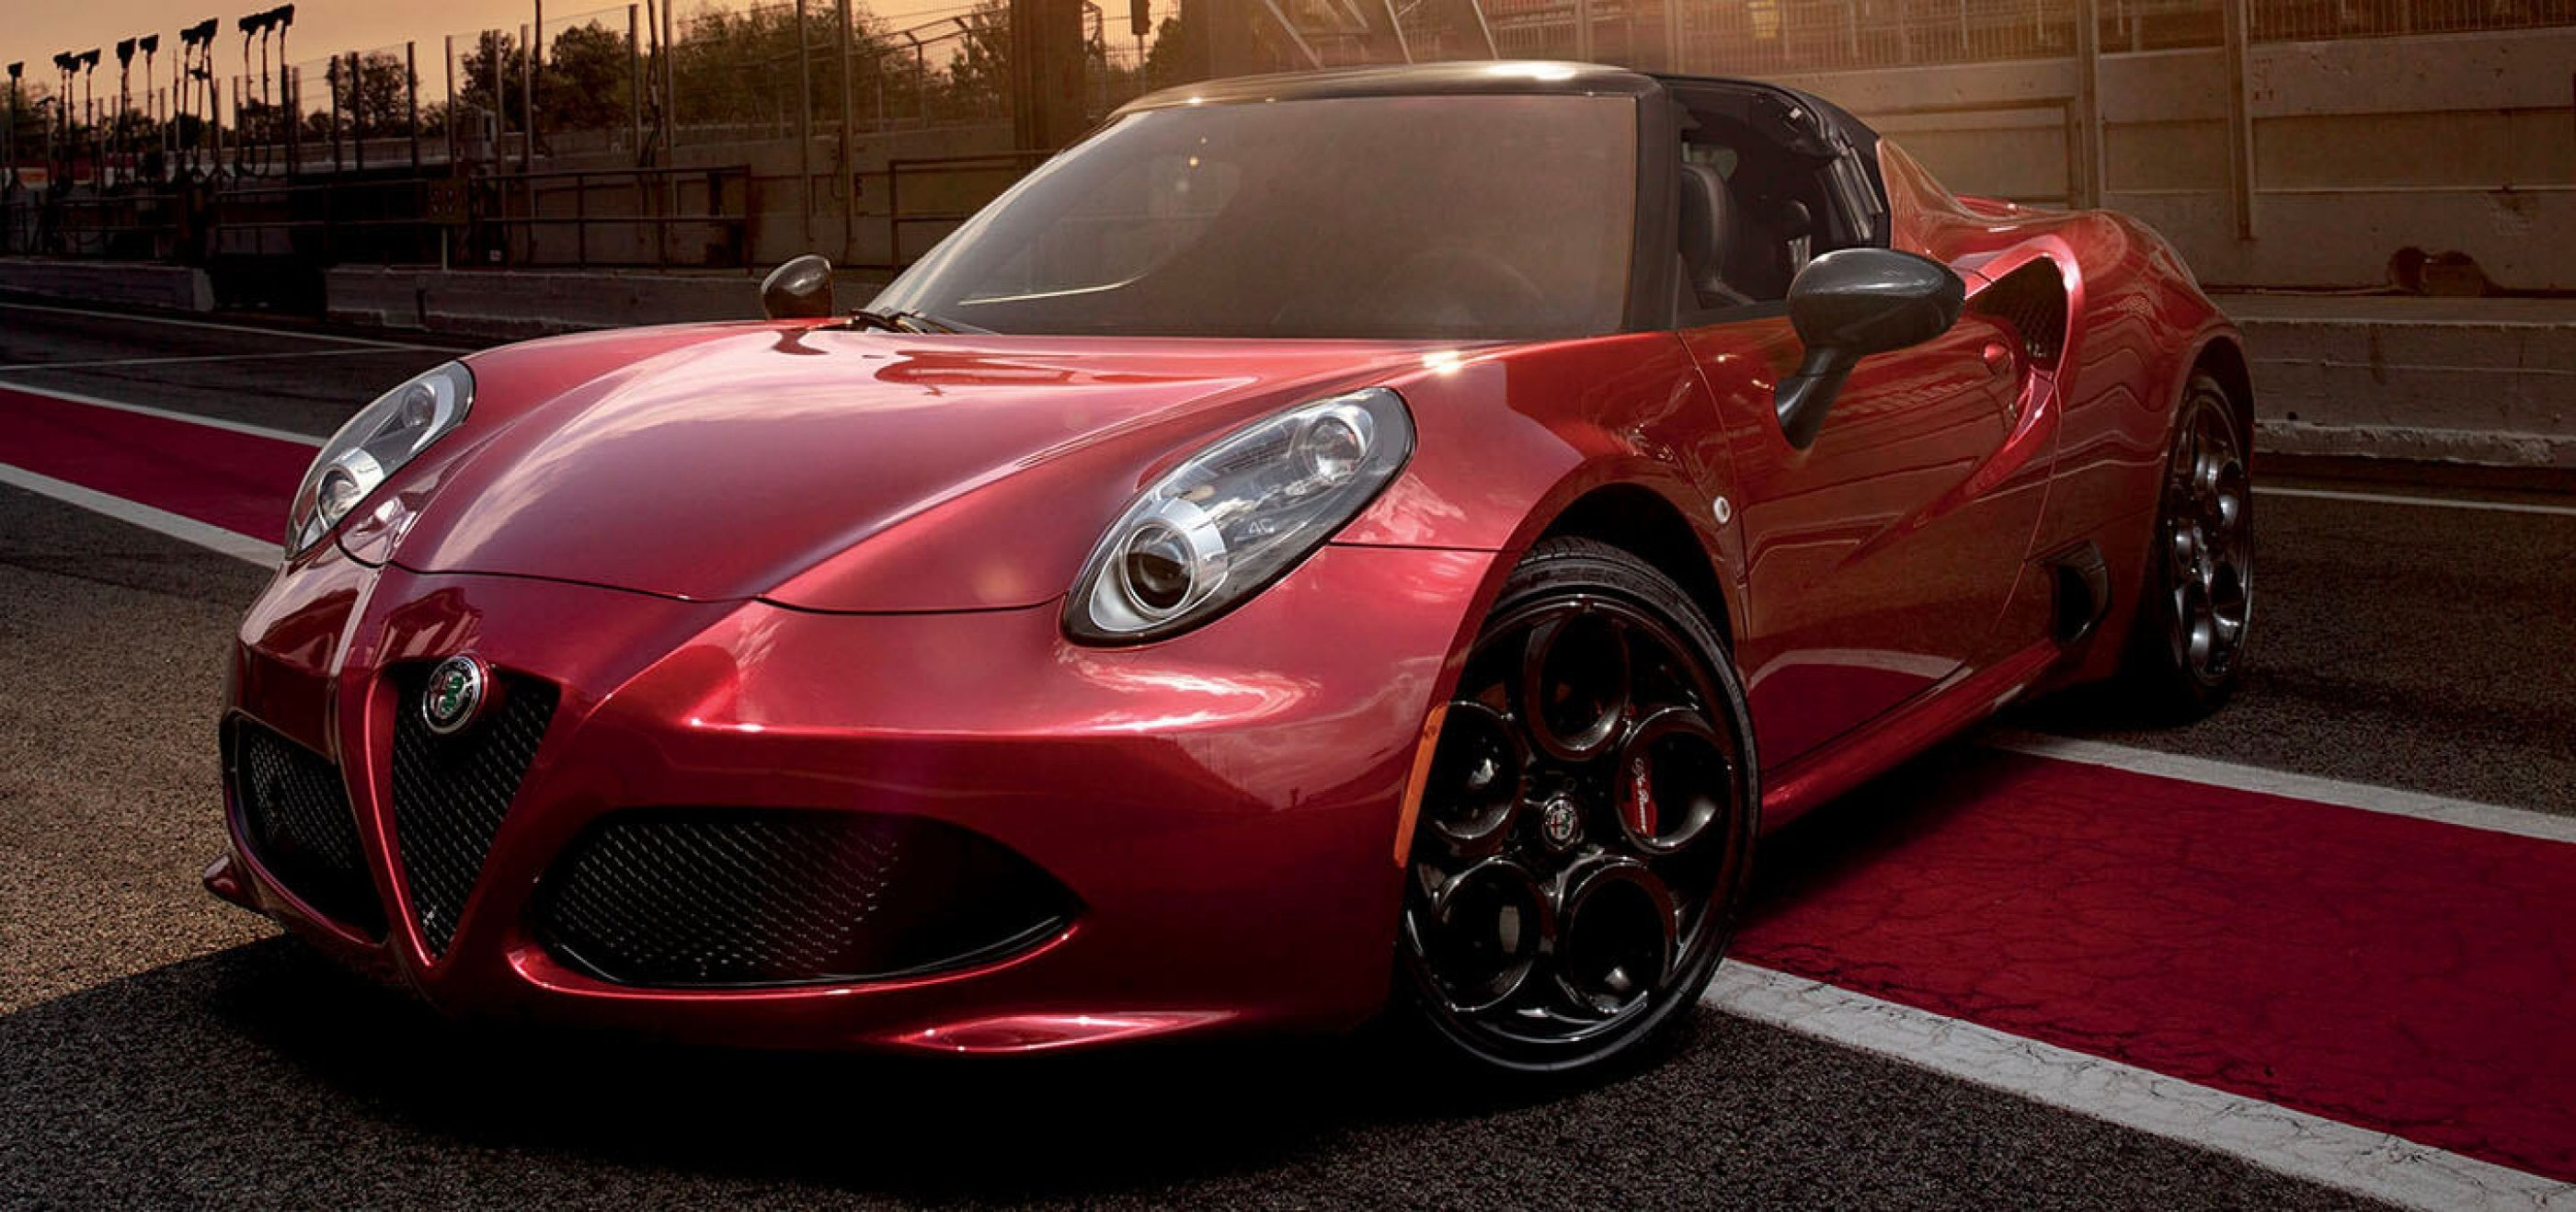 Alfa Romeo 4c 0 60 >> 2019 Alfa Romeo 4c Spider Style Performance Power